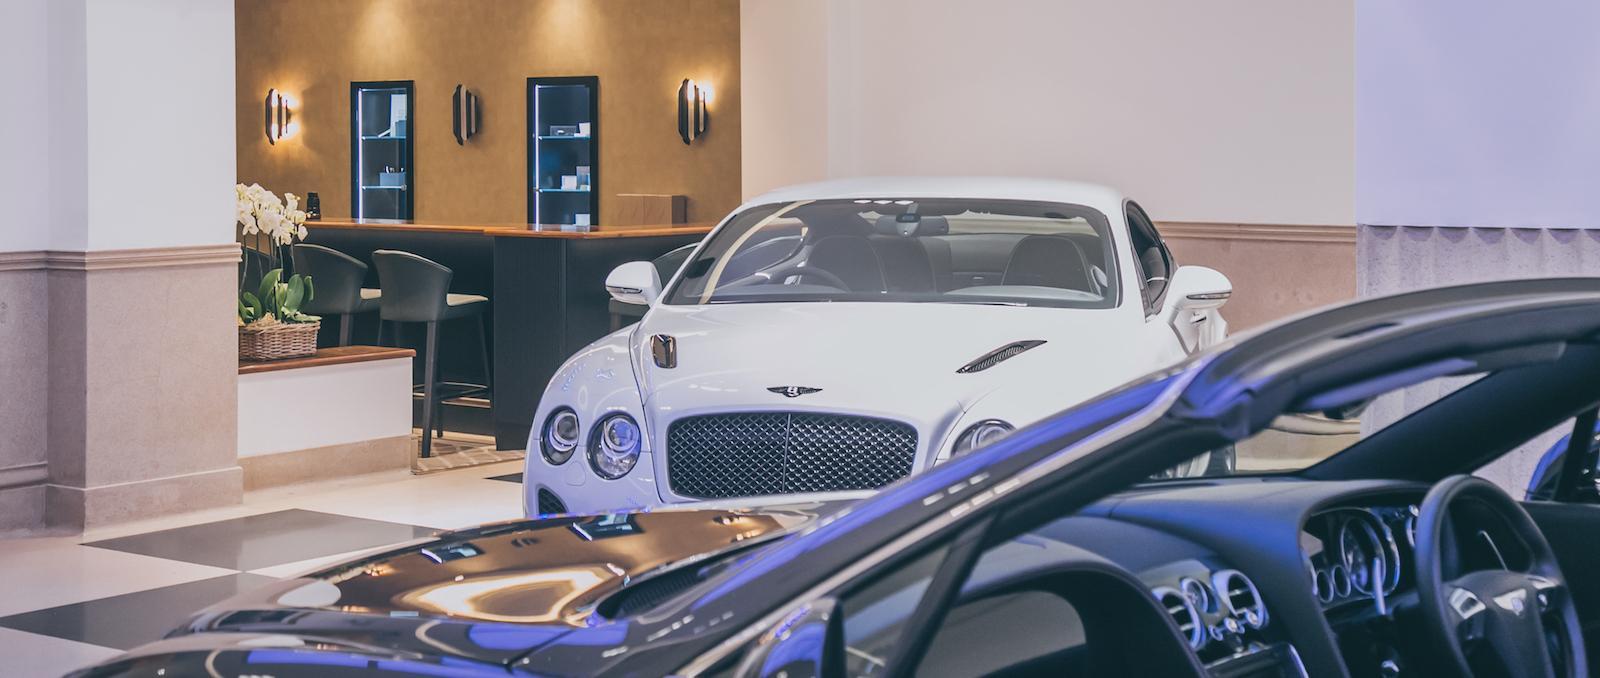 Look at the world's oldest Bentley showroom now!